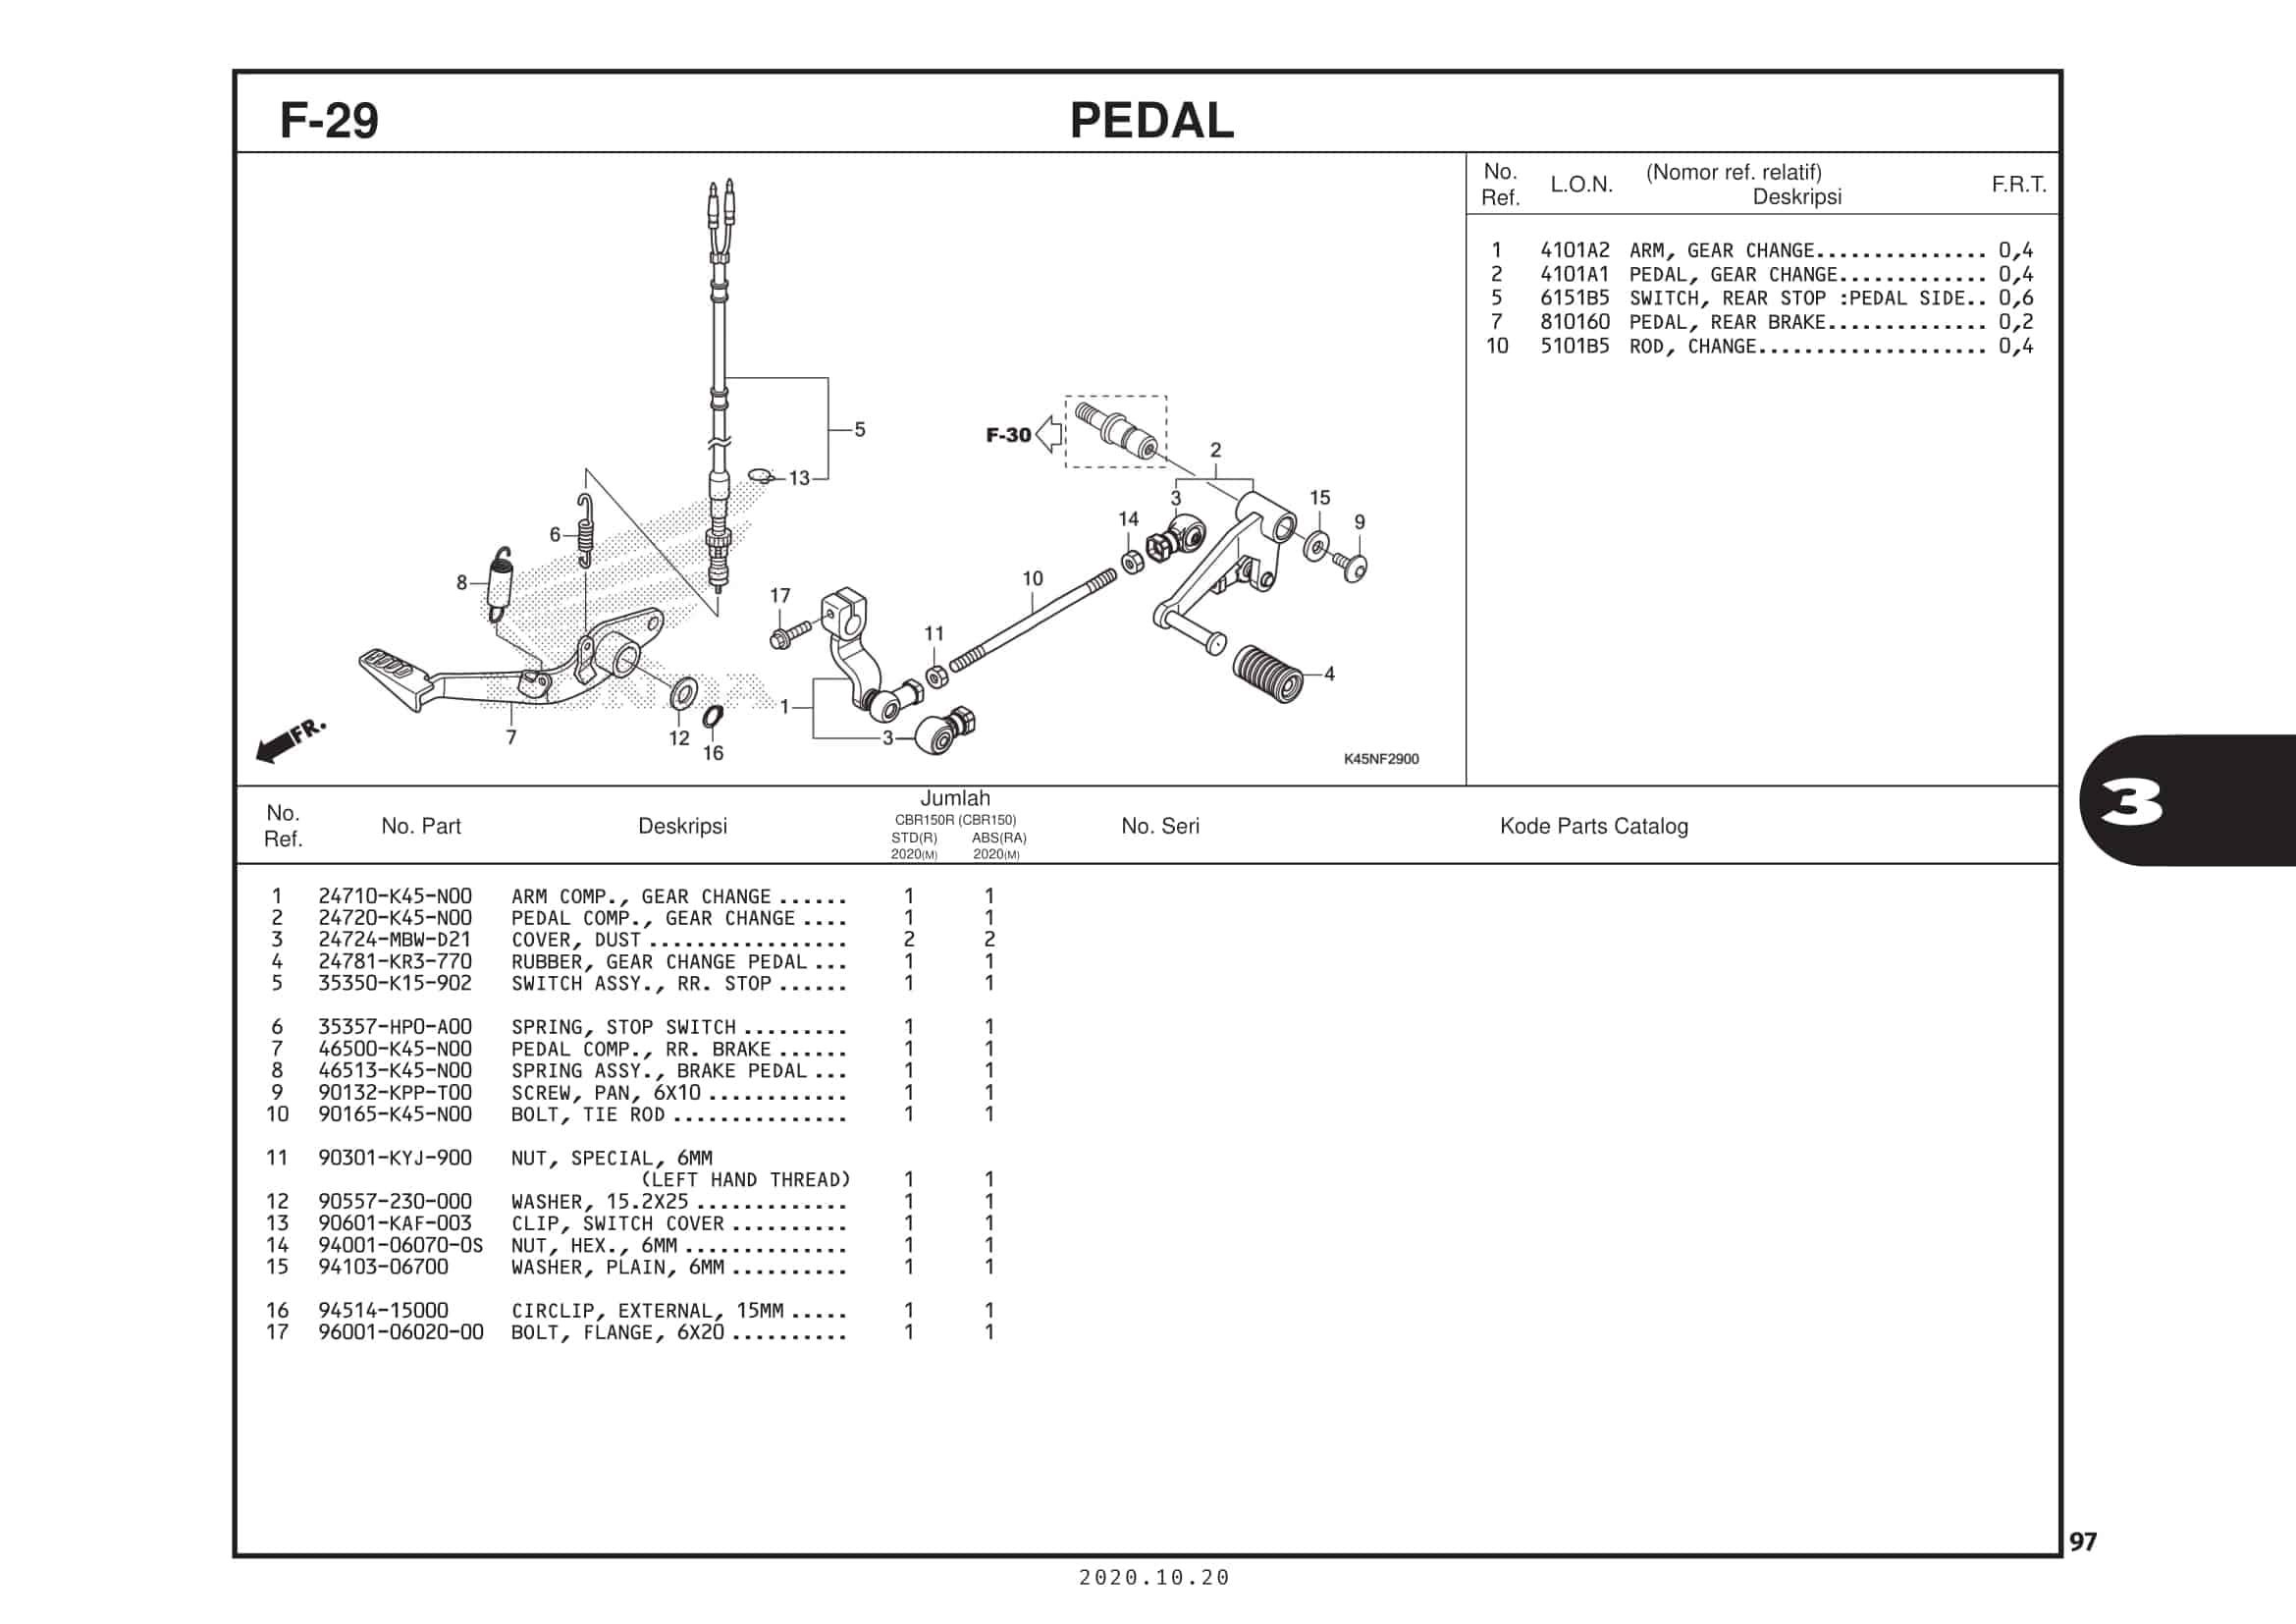 F-29 Pedal